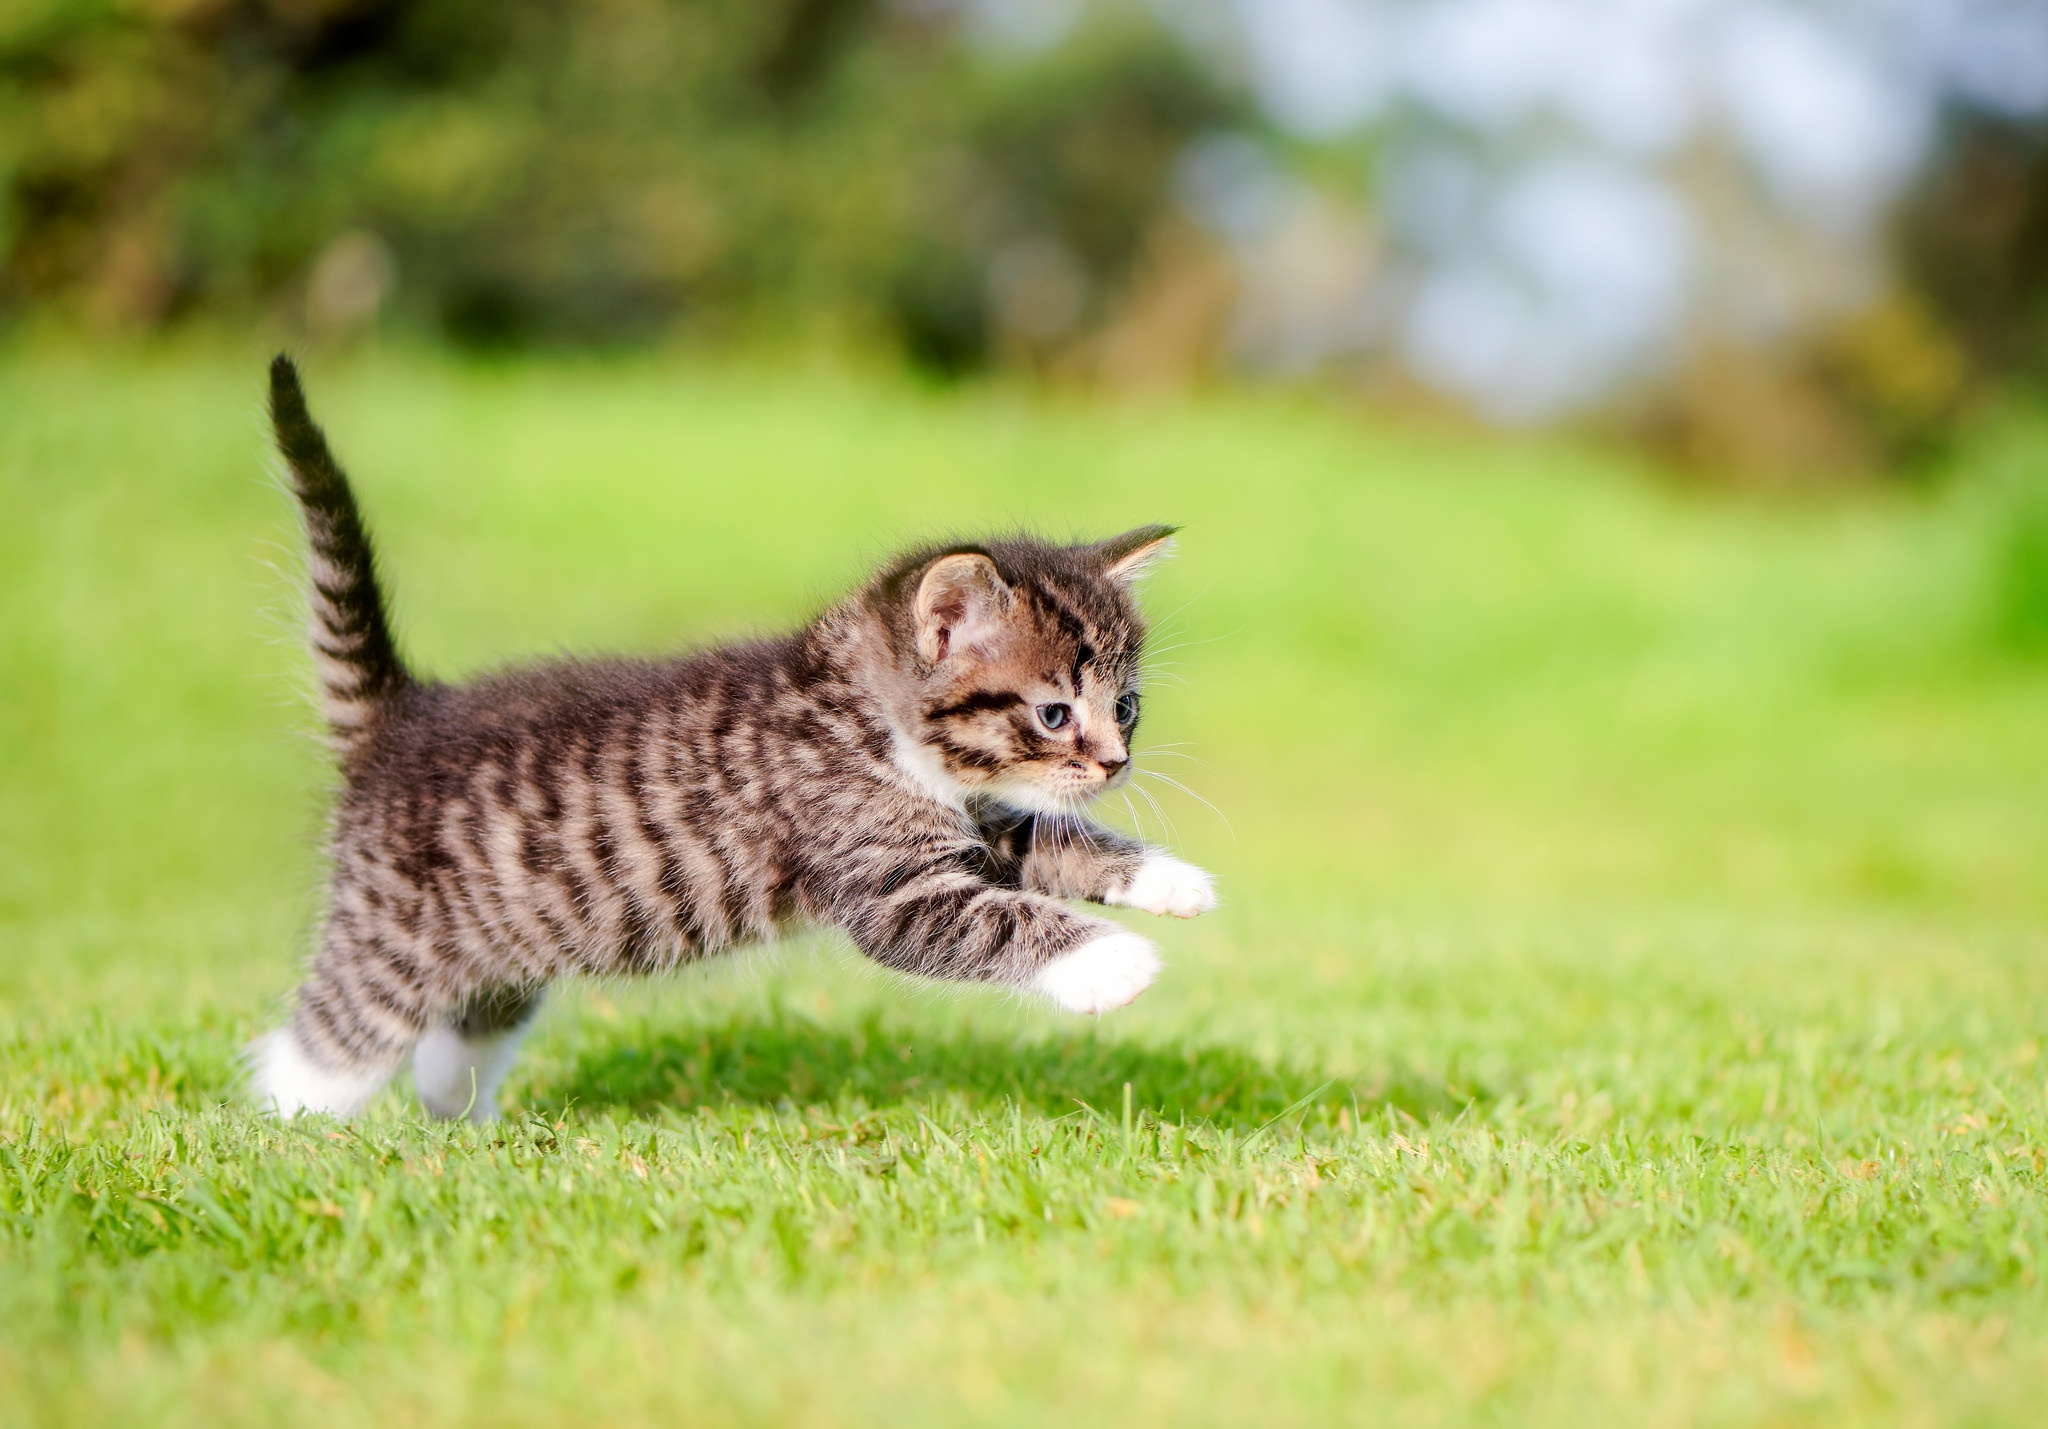 Котенок играющий с кошкой в траве  № 1994878 без смс